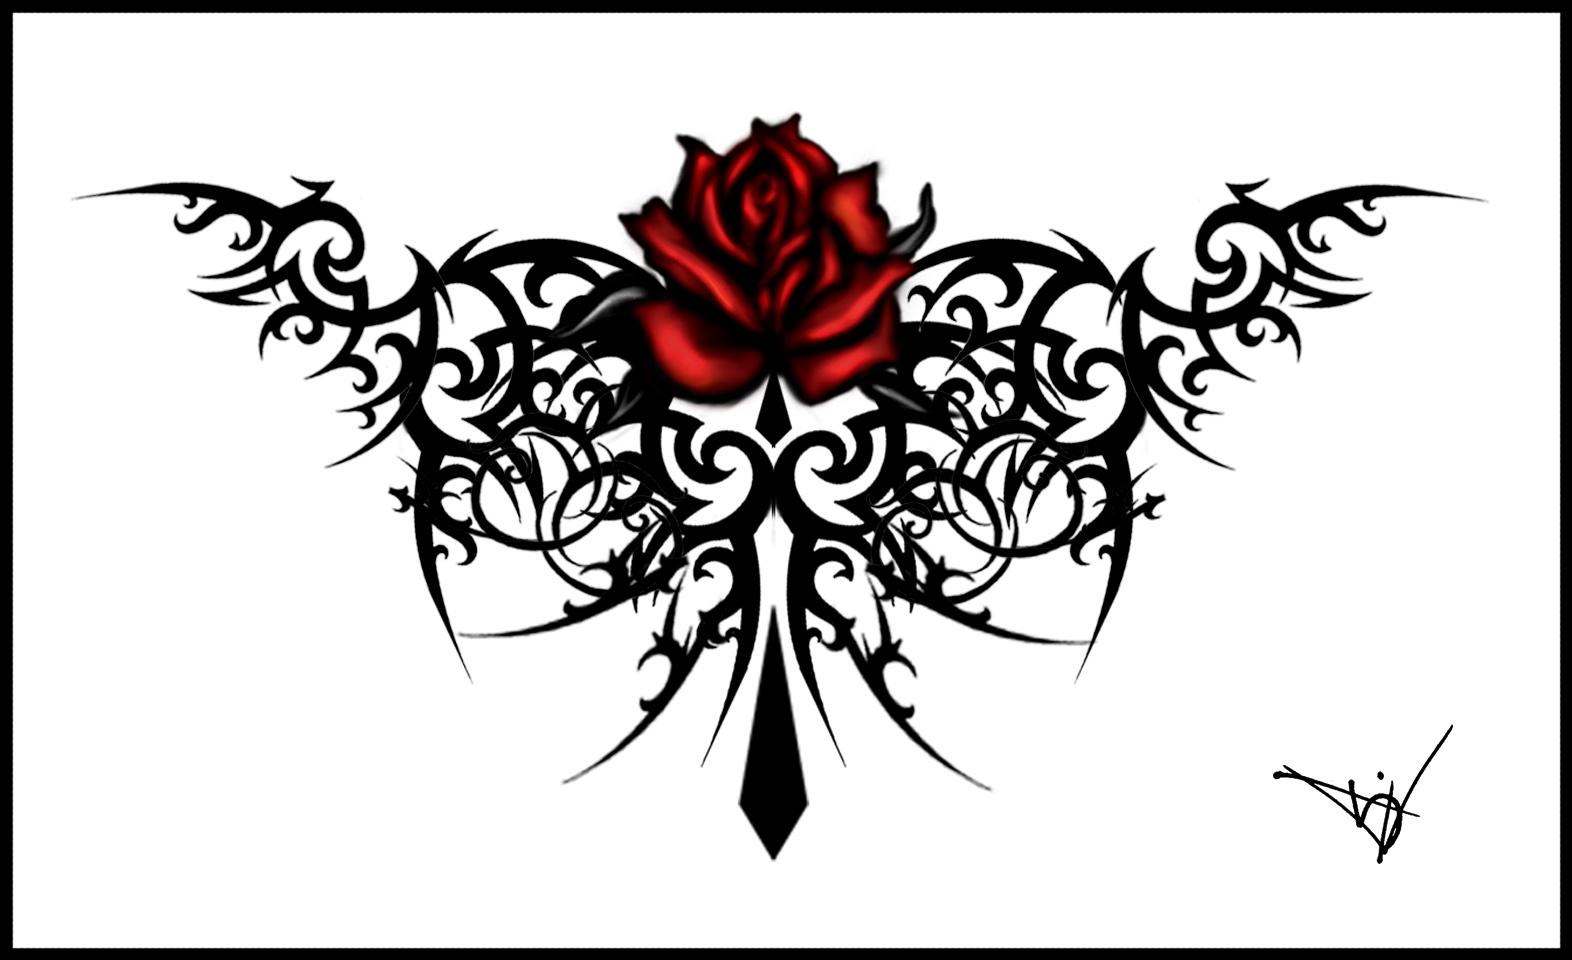 Tattoos magazine rose tattoos designs no 1 for Free rose tattoo stencils